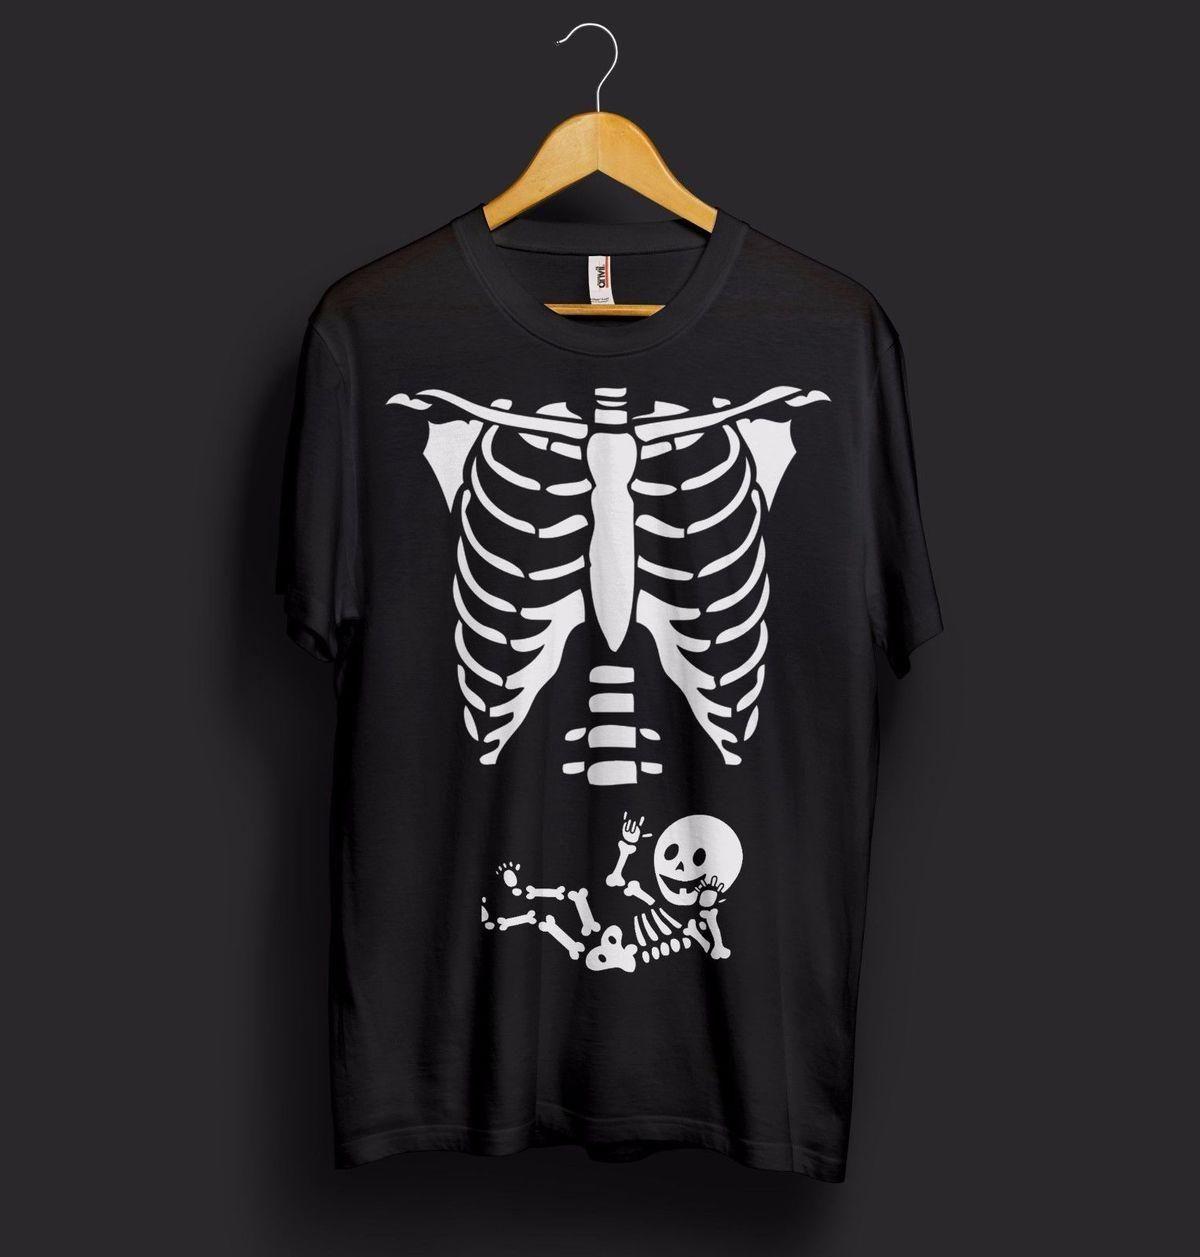 d78c1c12093 Maternity Baby Skeleton Halloween T Shirt Top Bones Funny Scary Loading  Pregnant Printed Men T Shirt Short Sleeve Funny Humorous T Shirts T Shirts  Funny ...